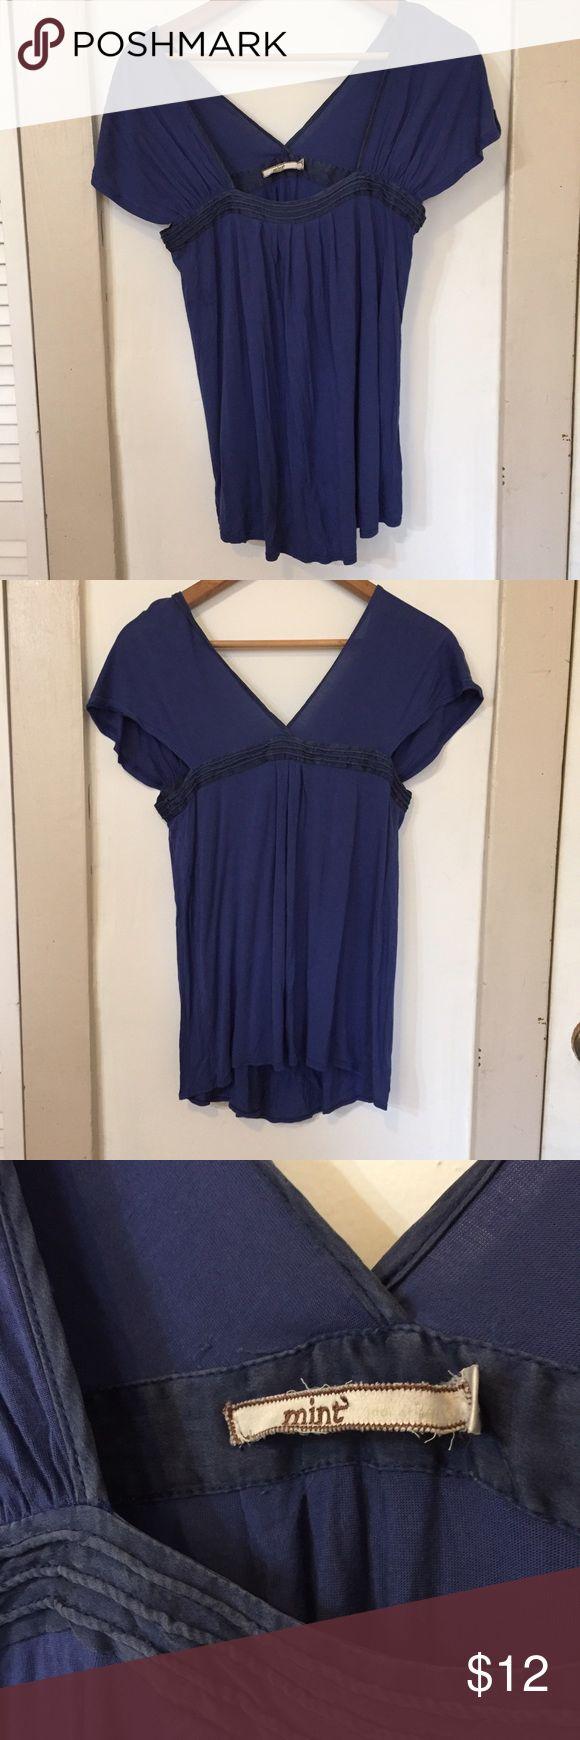 Mint deep blue cap sleeve wrap top Mint deep blue cap sleeve draped wrap top, soft middle weight fabric, contrasting slate blue detailing, EUC. mint Tops Blouses